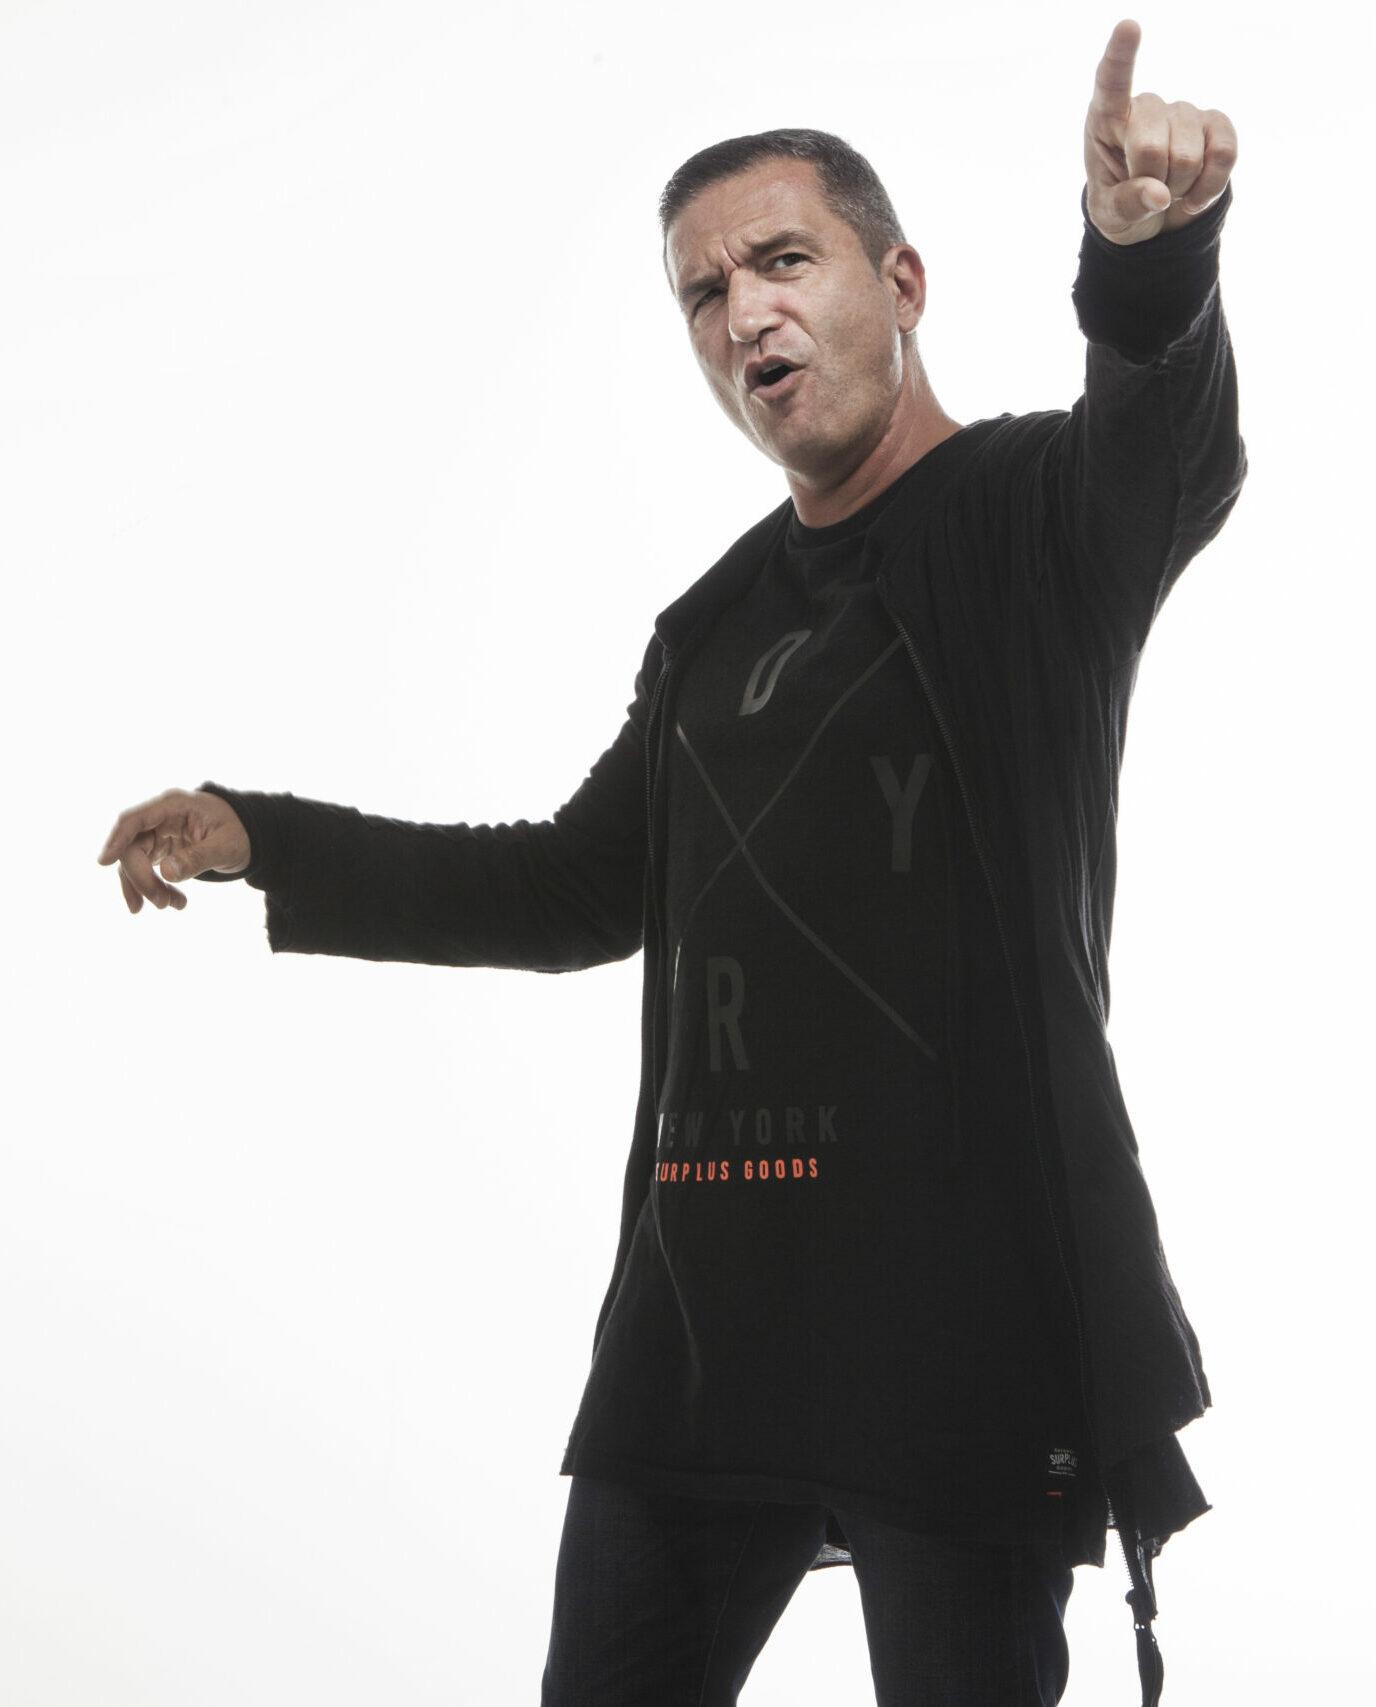 Jordi Carreras DJ